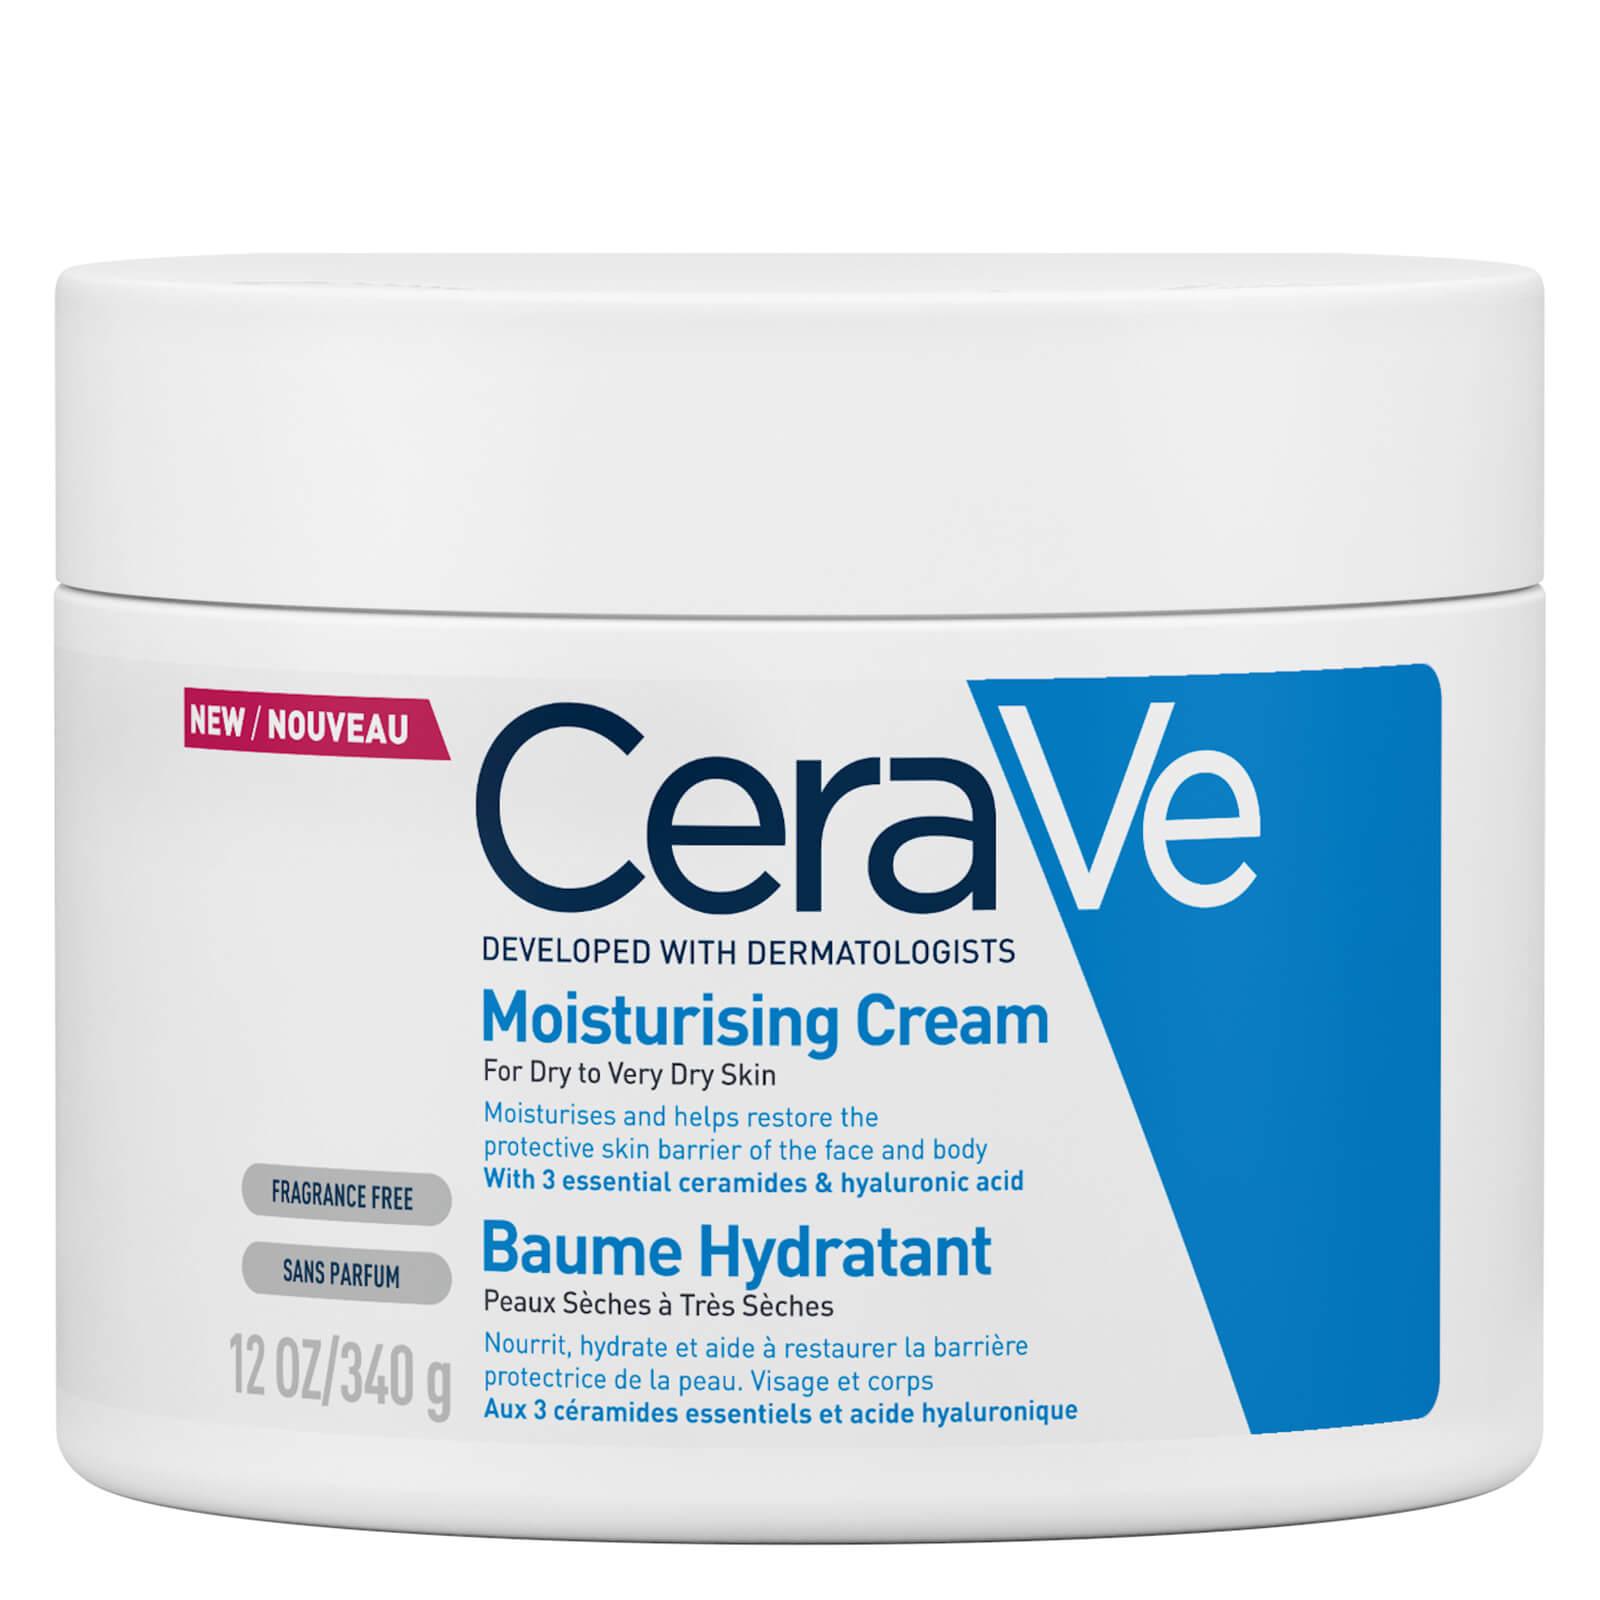 Image of CeraVe crema idratante (340 g)